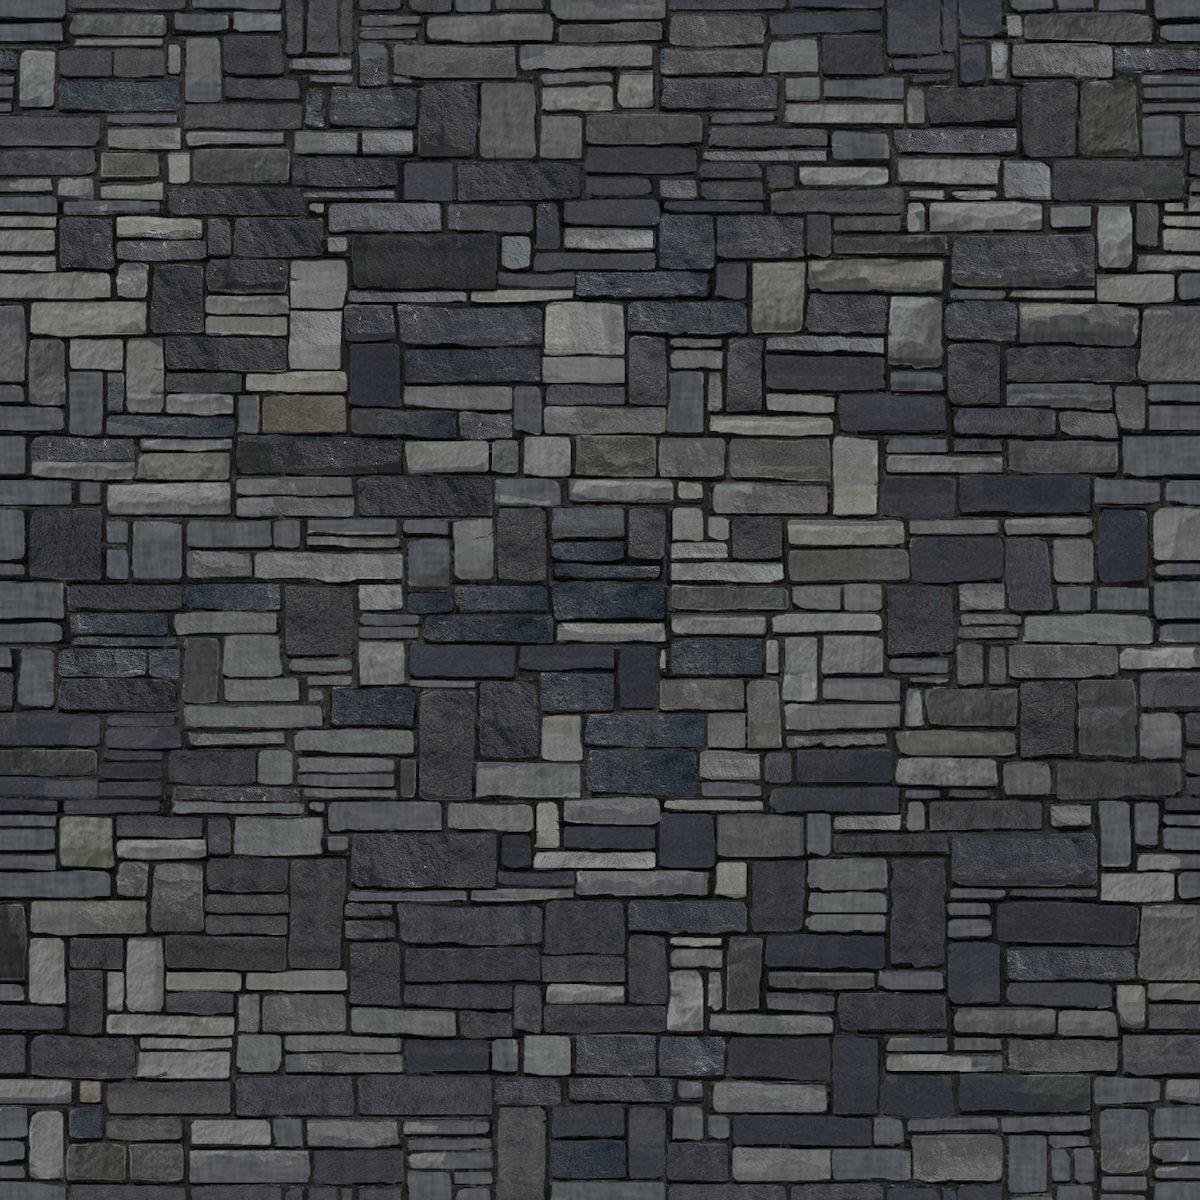 Kitchen Brick Wall Decorations